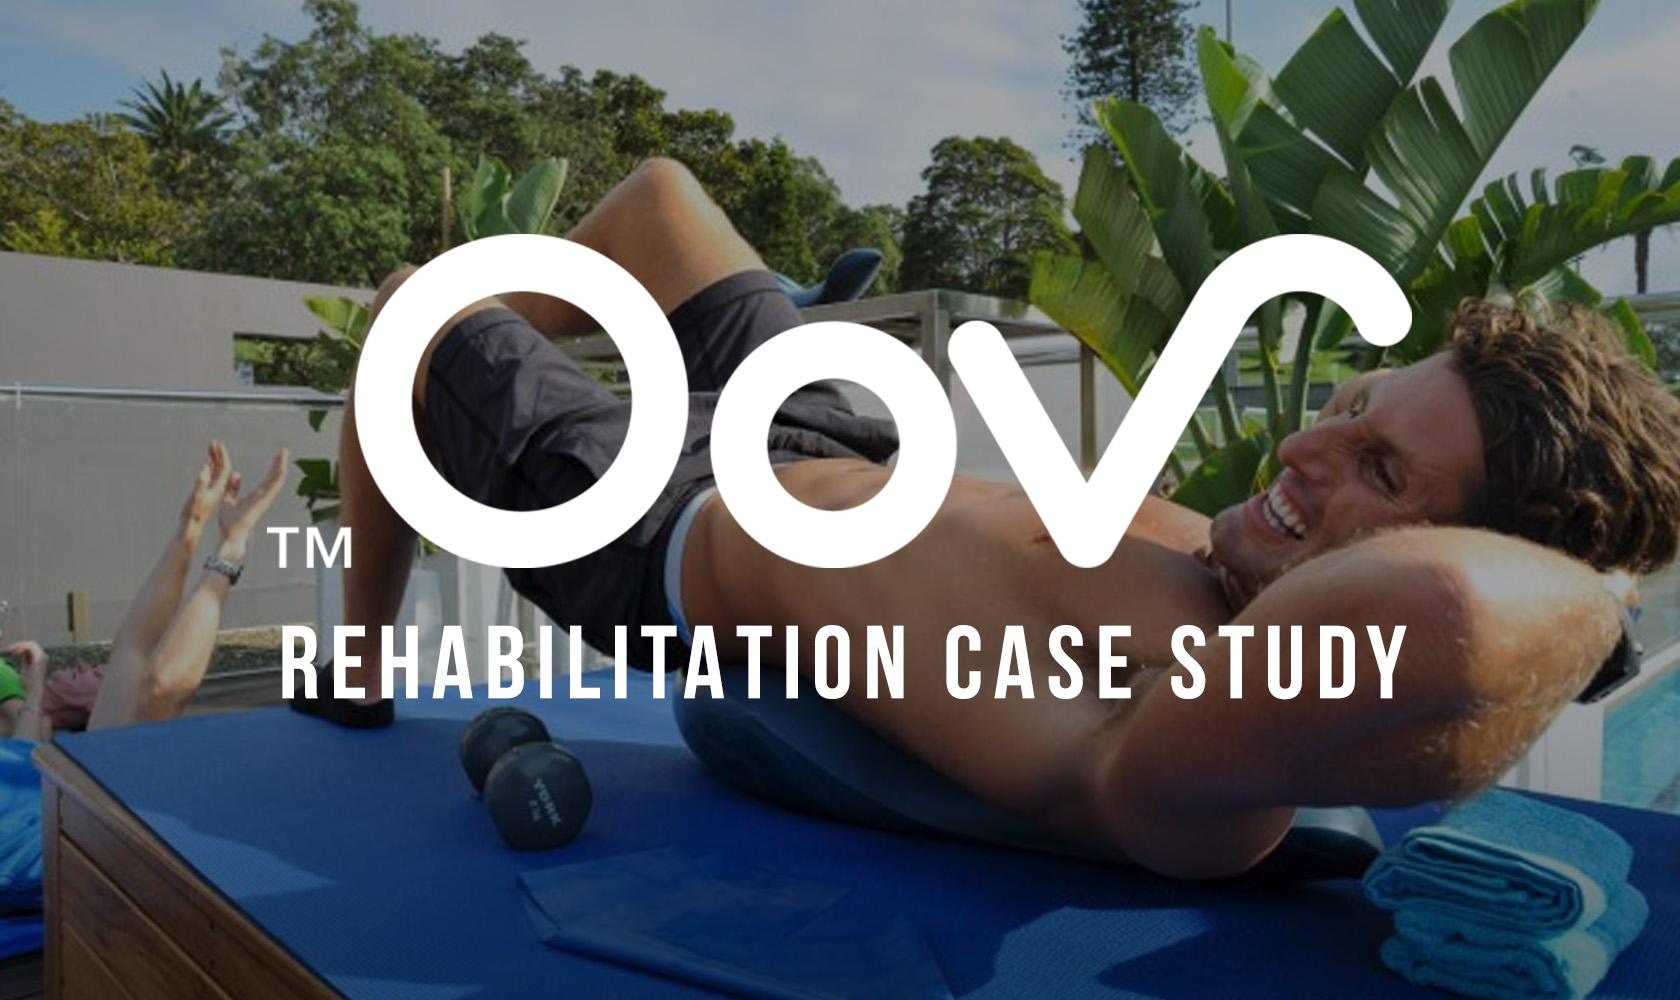 Oov Rehabilitation Case Study